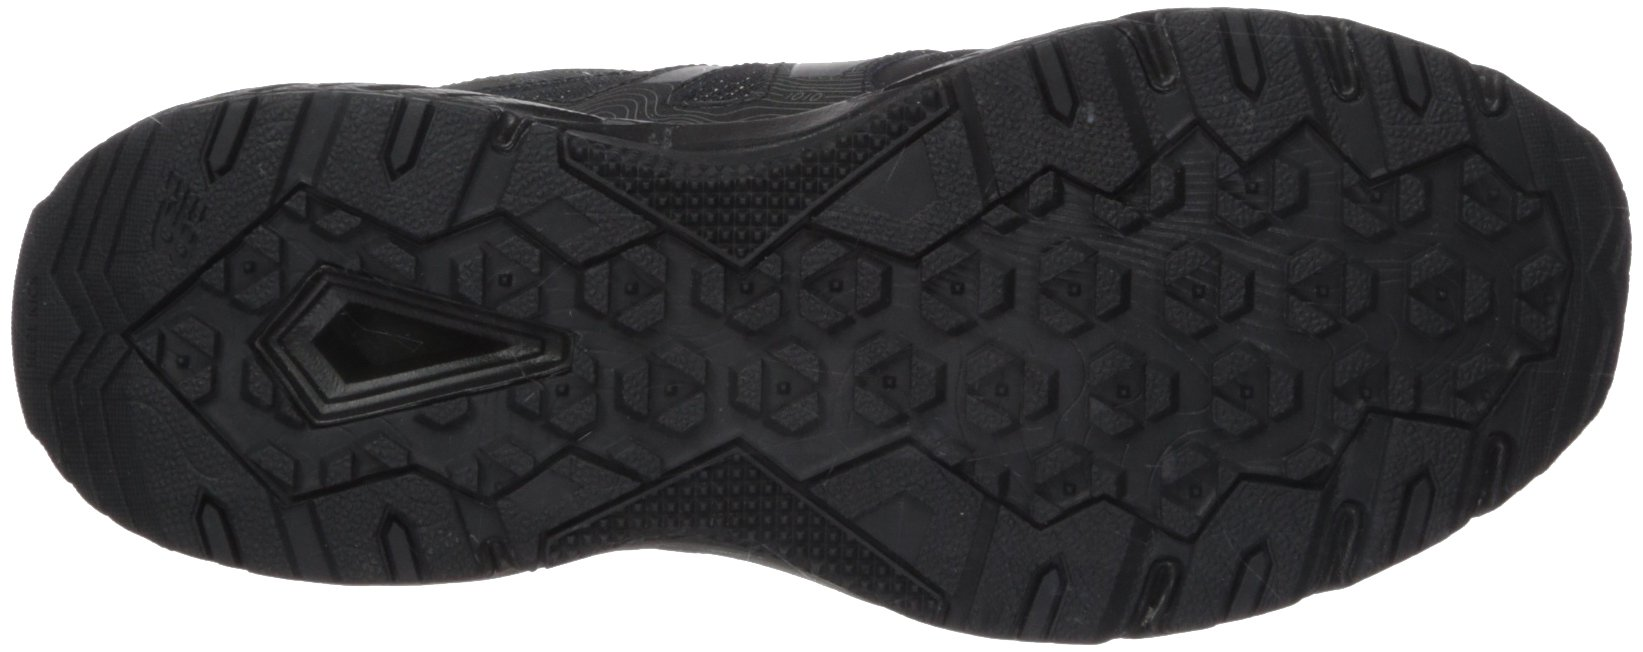 New Balance Men's 510v4 Cushioning Trail Running Shoe, Black, 7 D US by New Balance (Image #3)